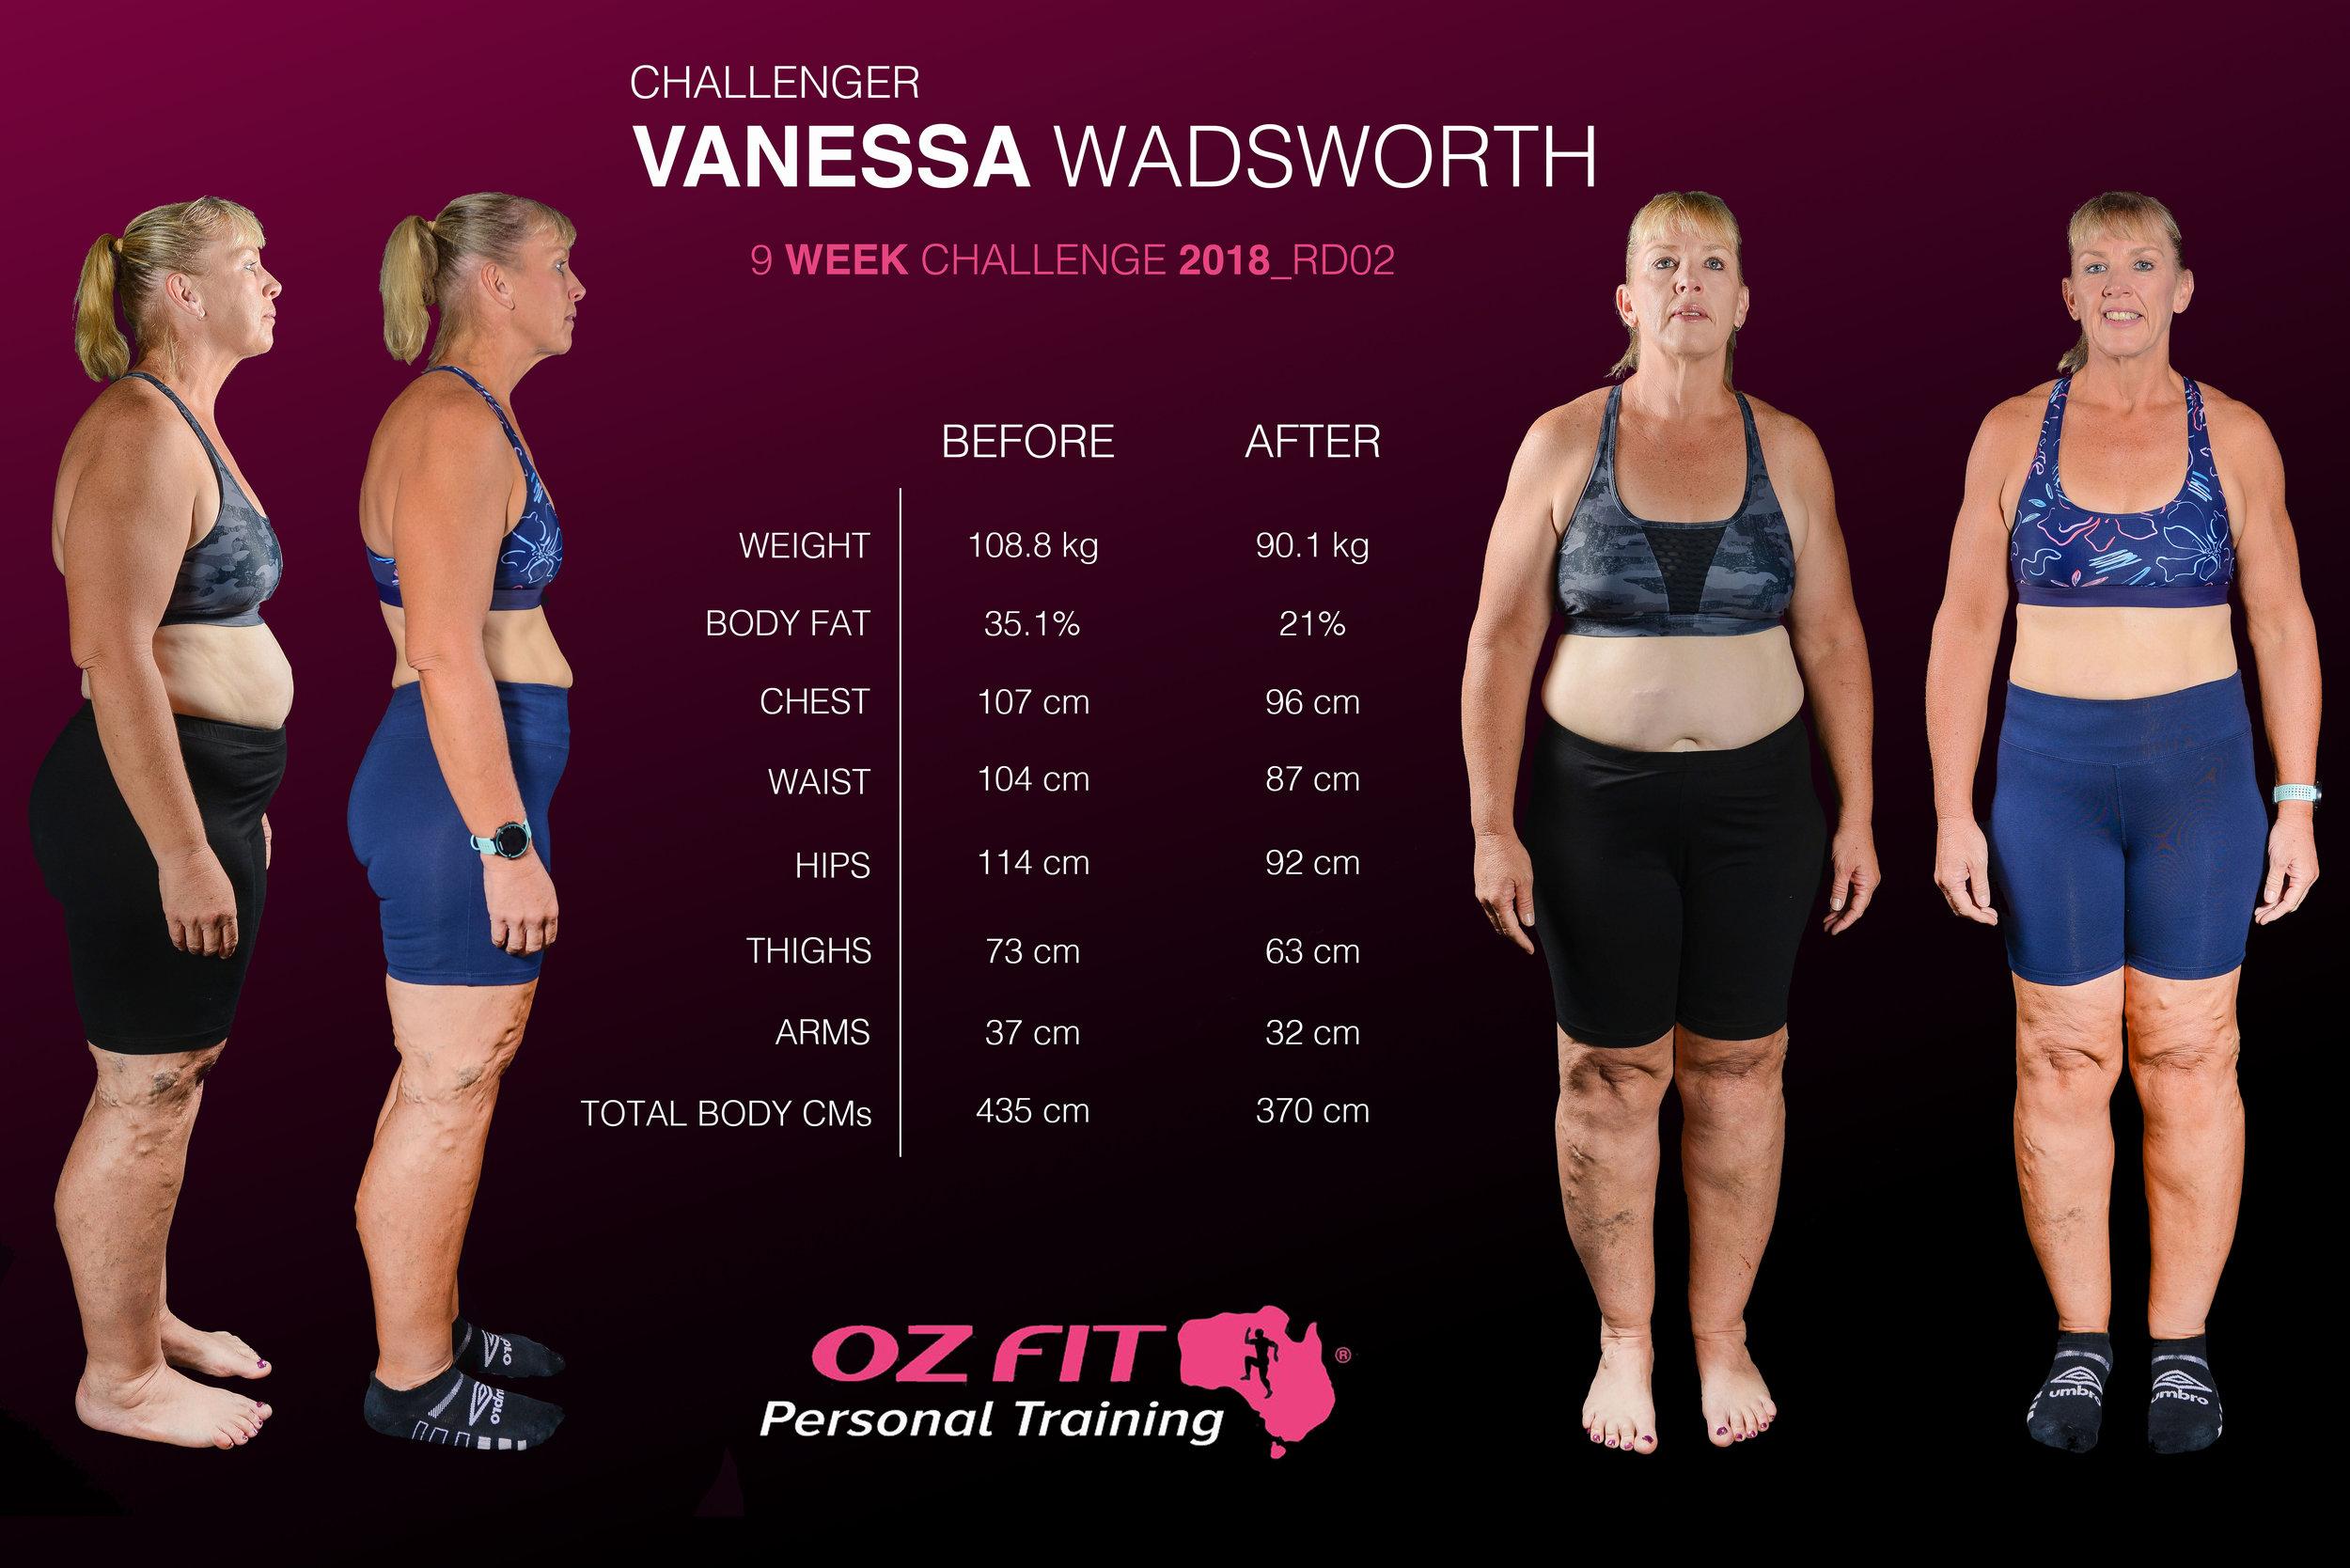 VanessaWadsworth.jpg